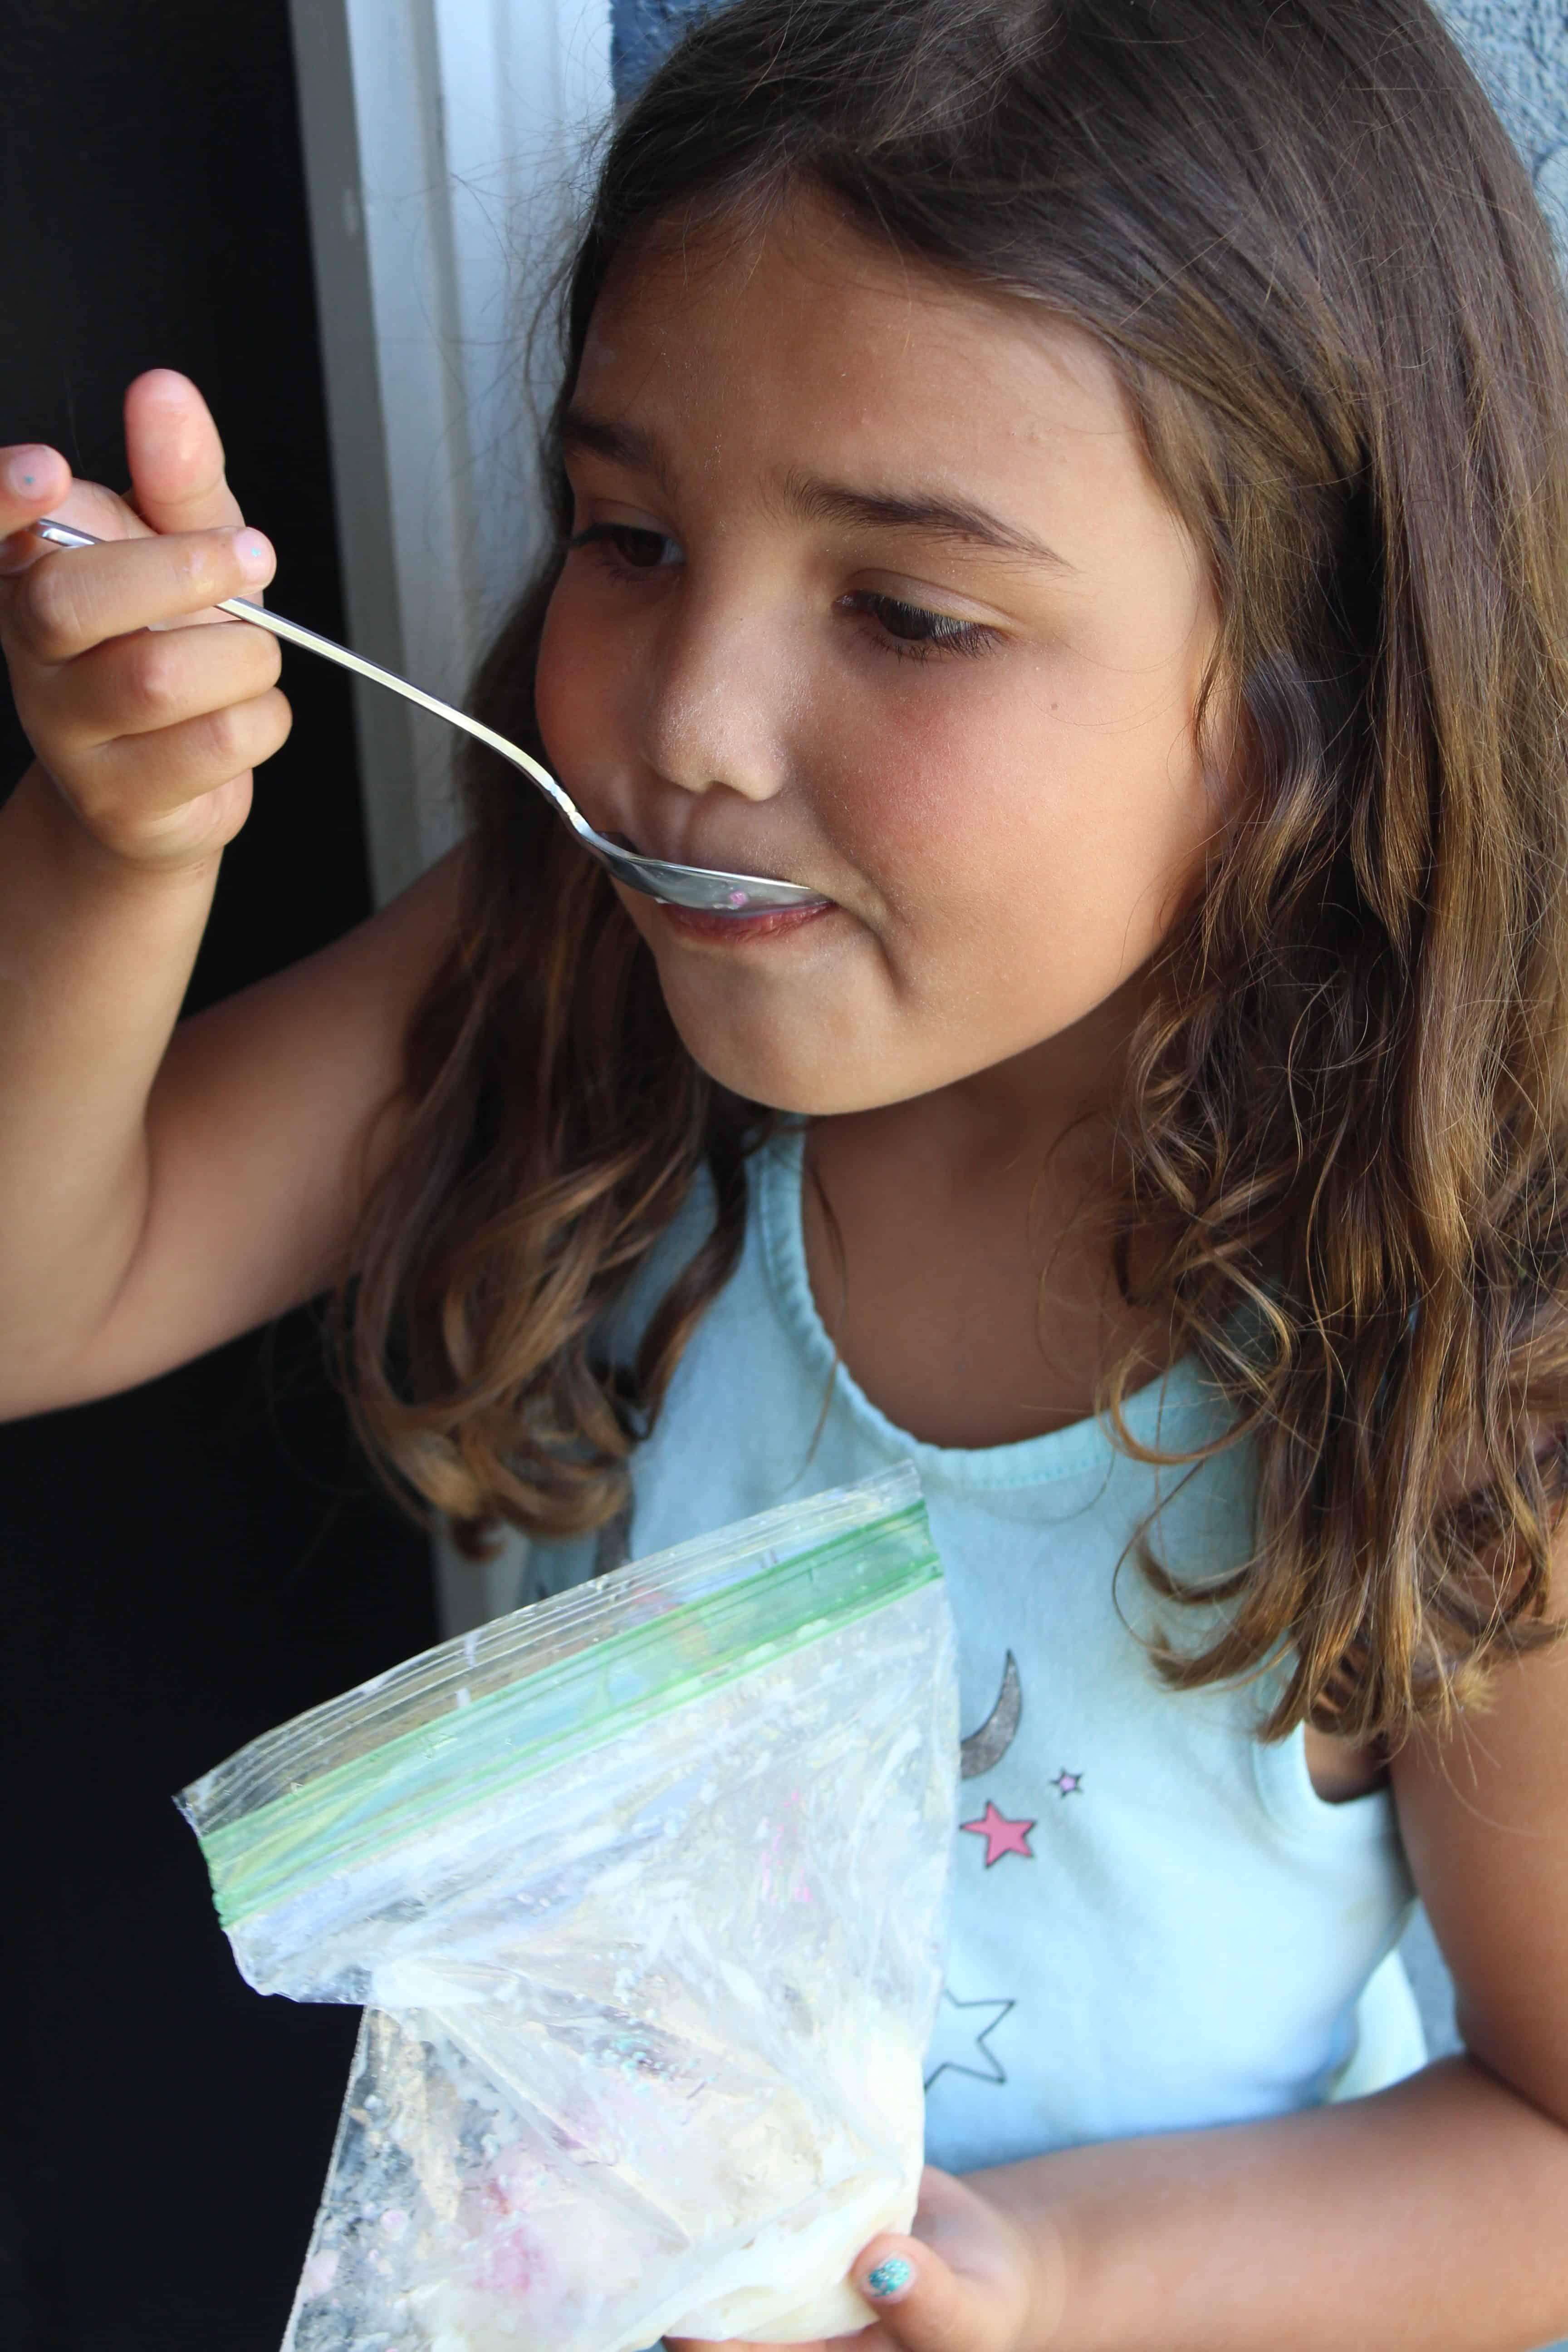 Child with spoon tasting homemade Ice cream!